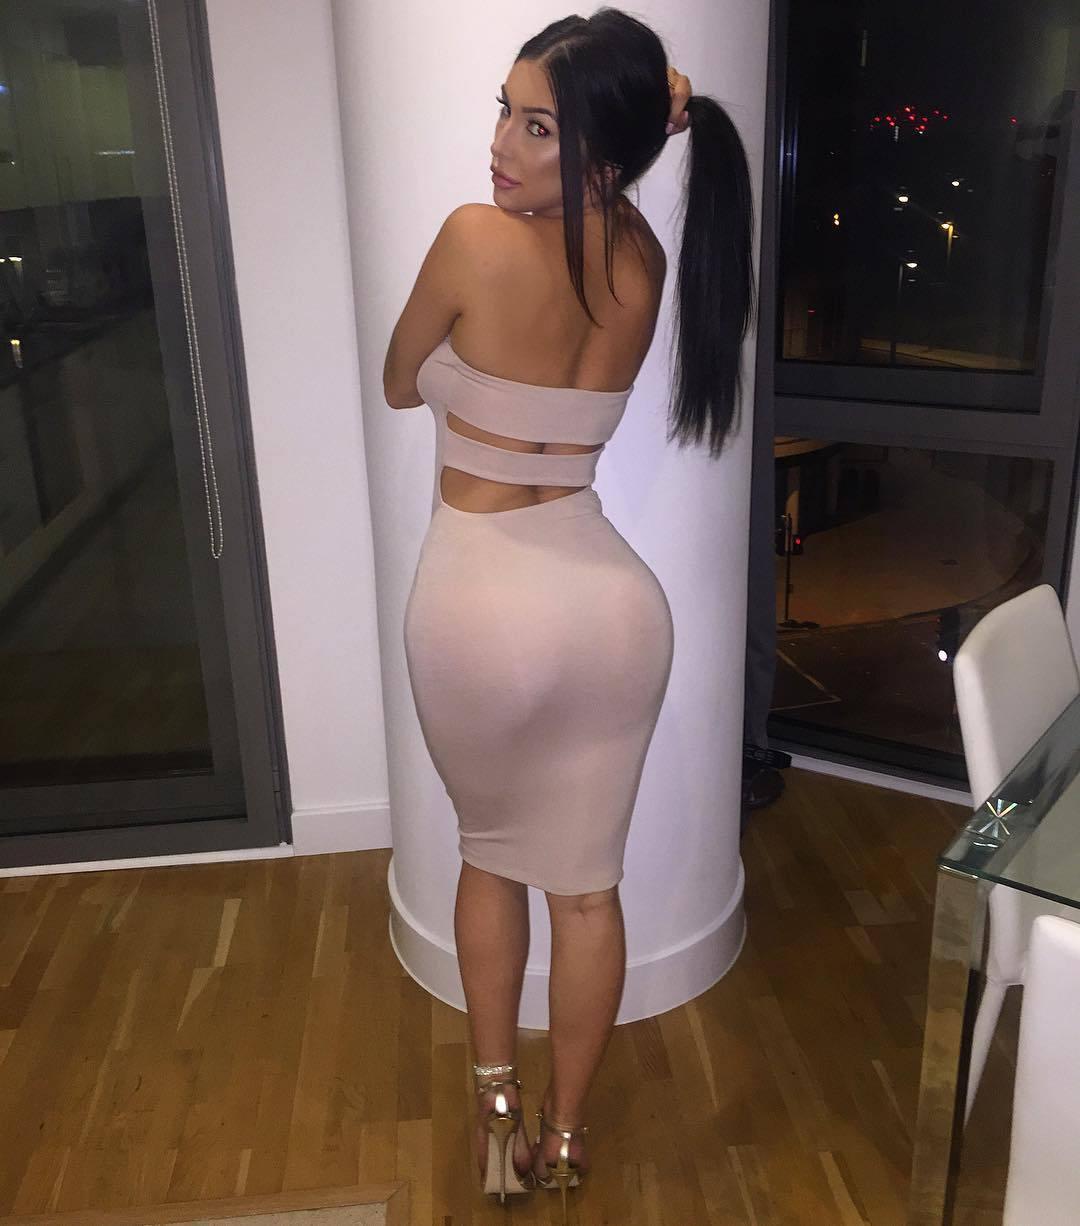 Erin Budina – Sexy Body In Racy Instagram Pics 0003